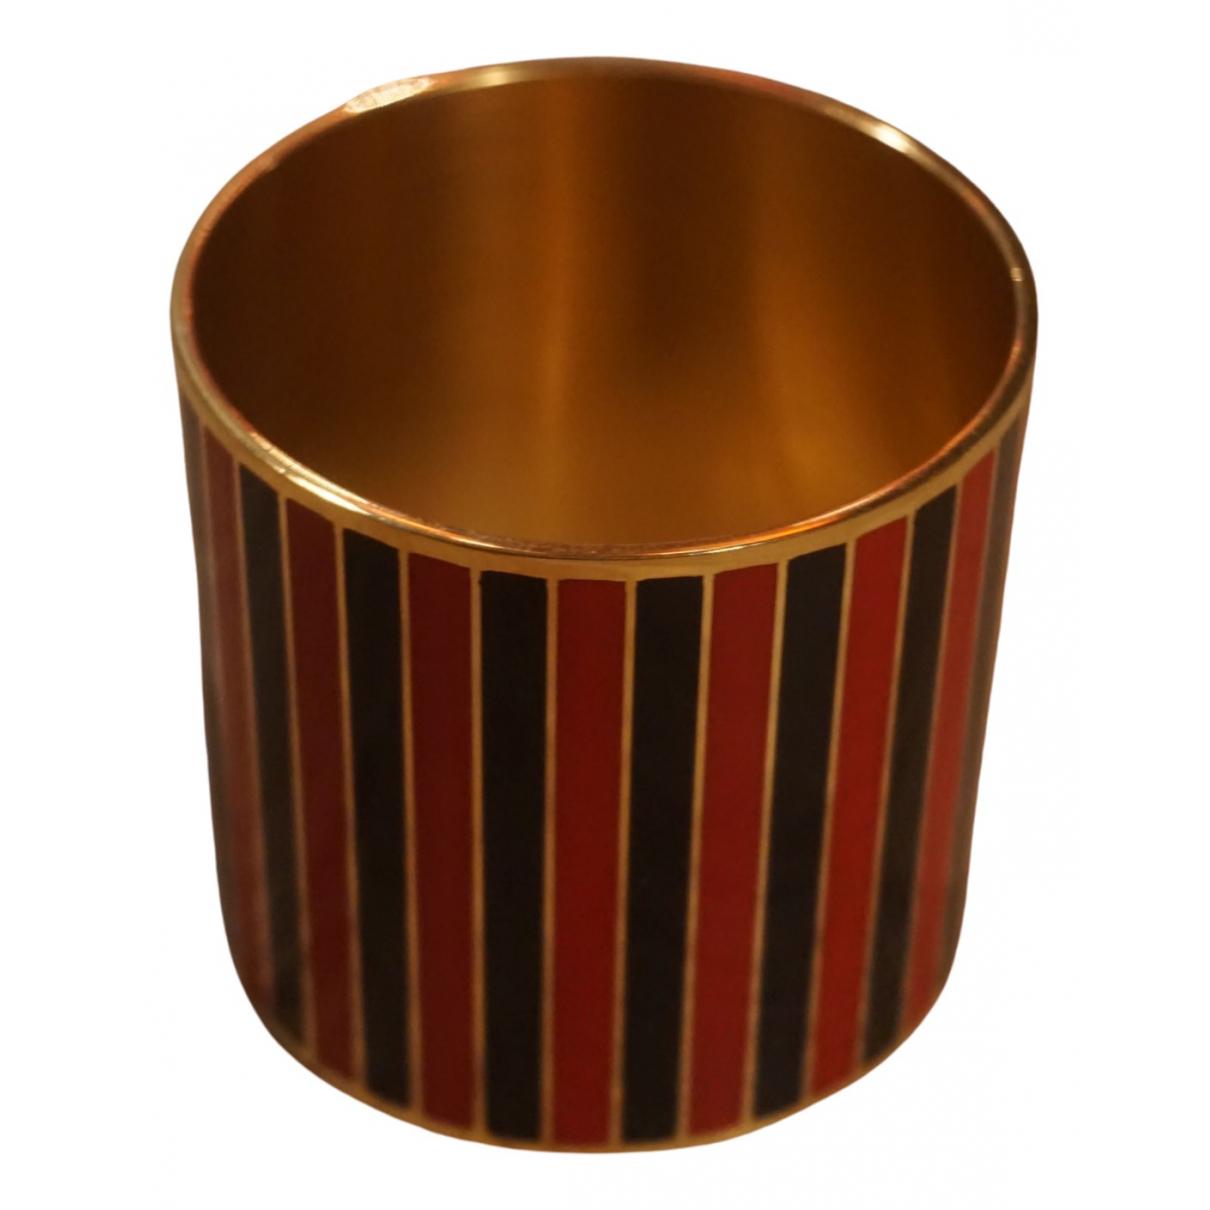 Givenchy - Bracelet   pour femme en or jaune - rouge